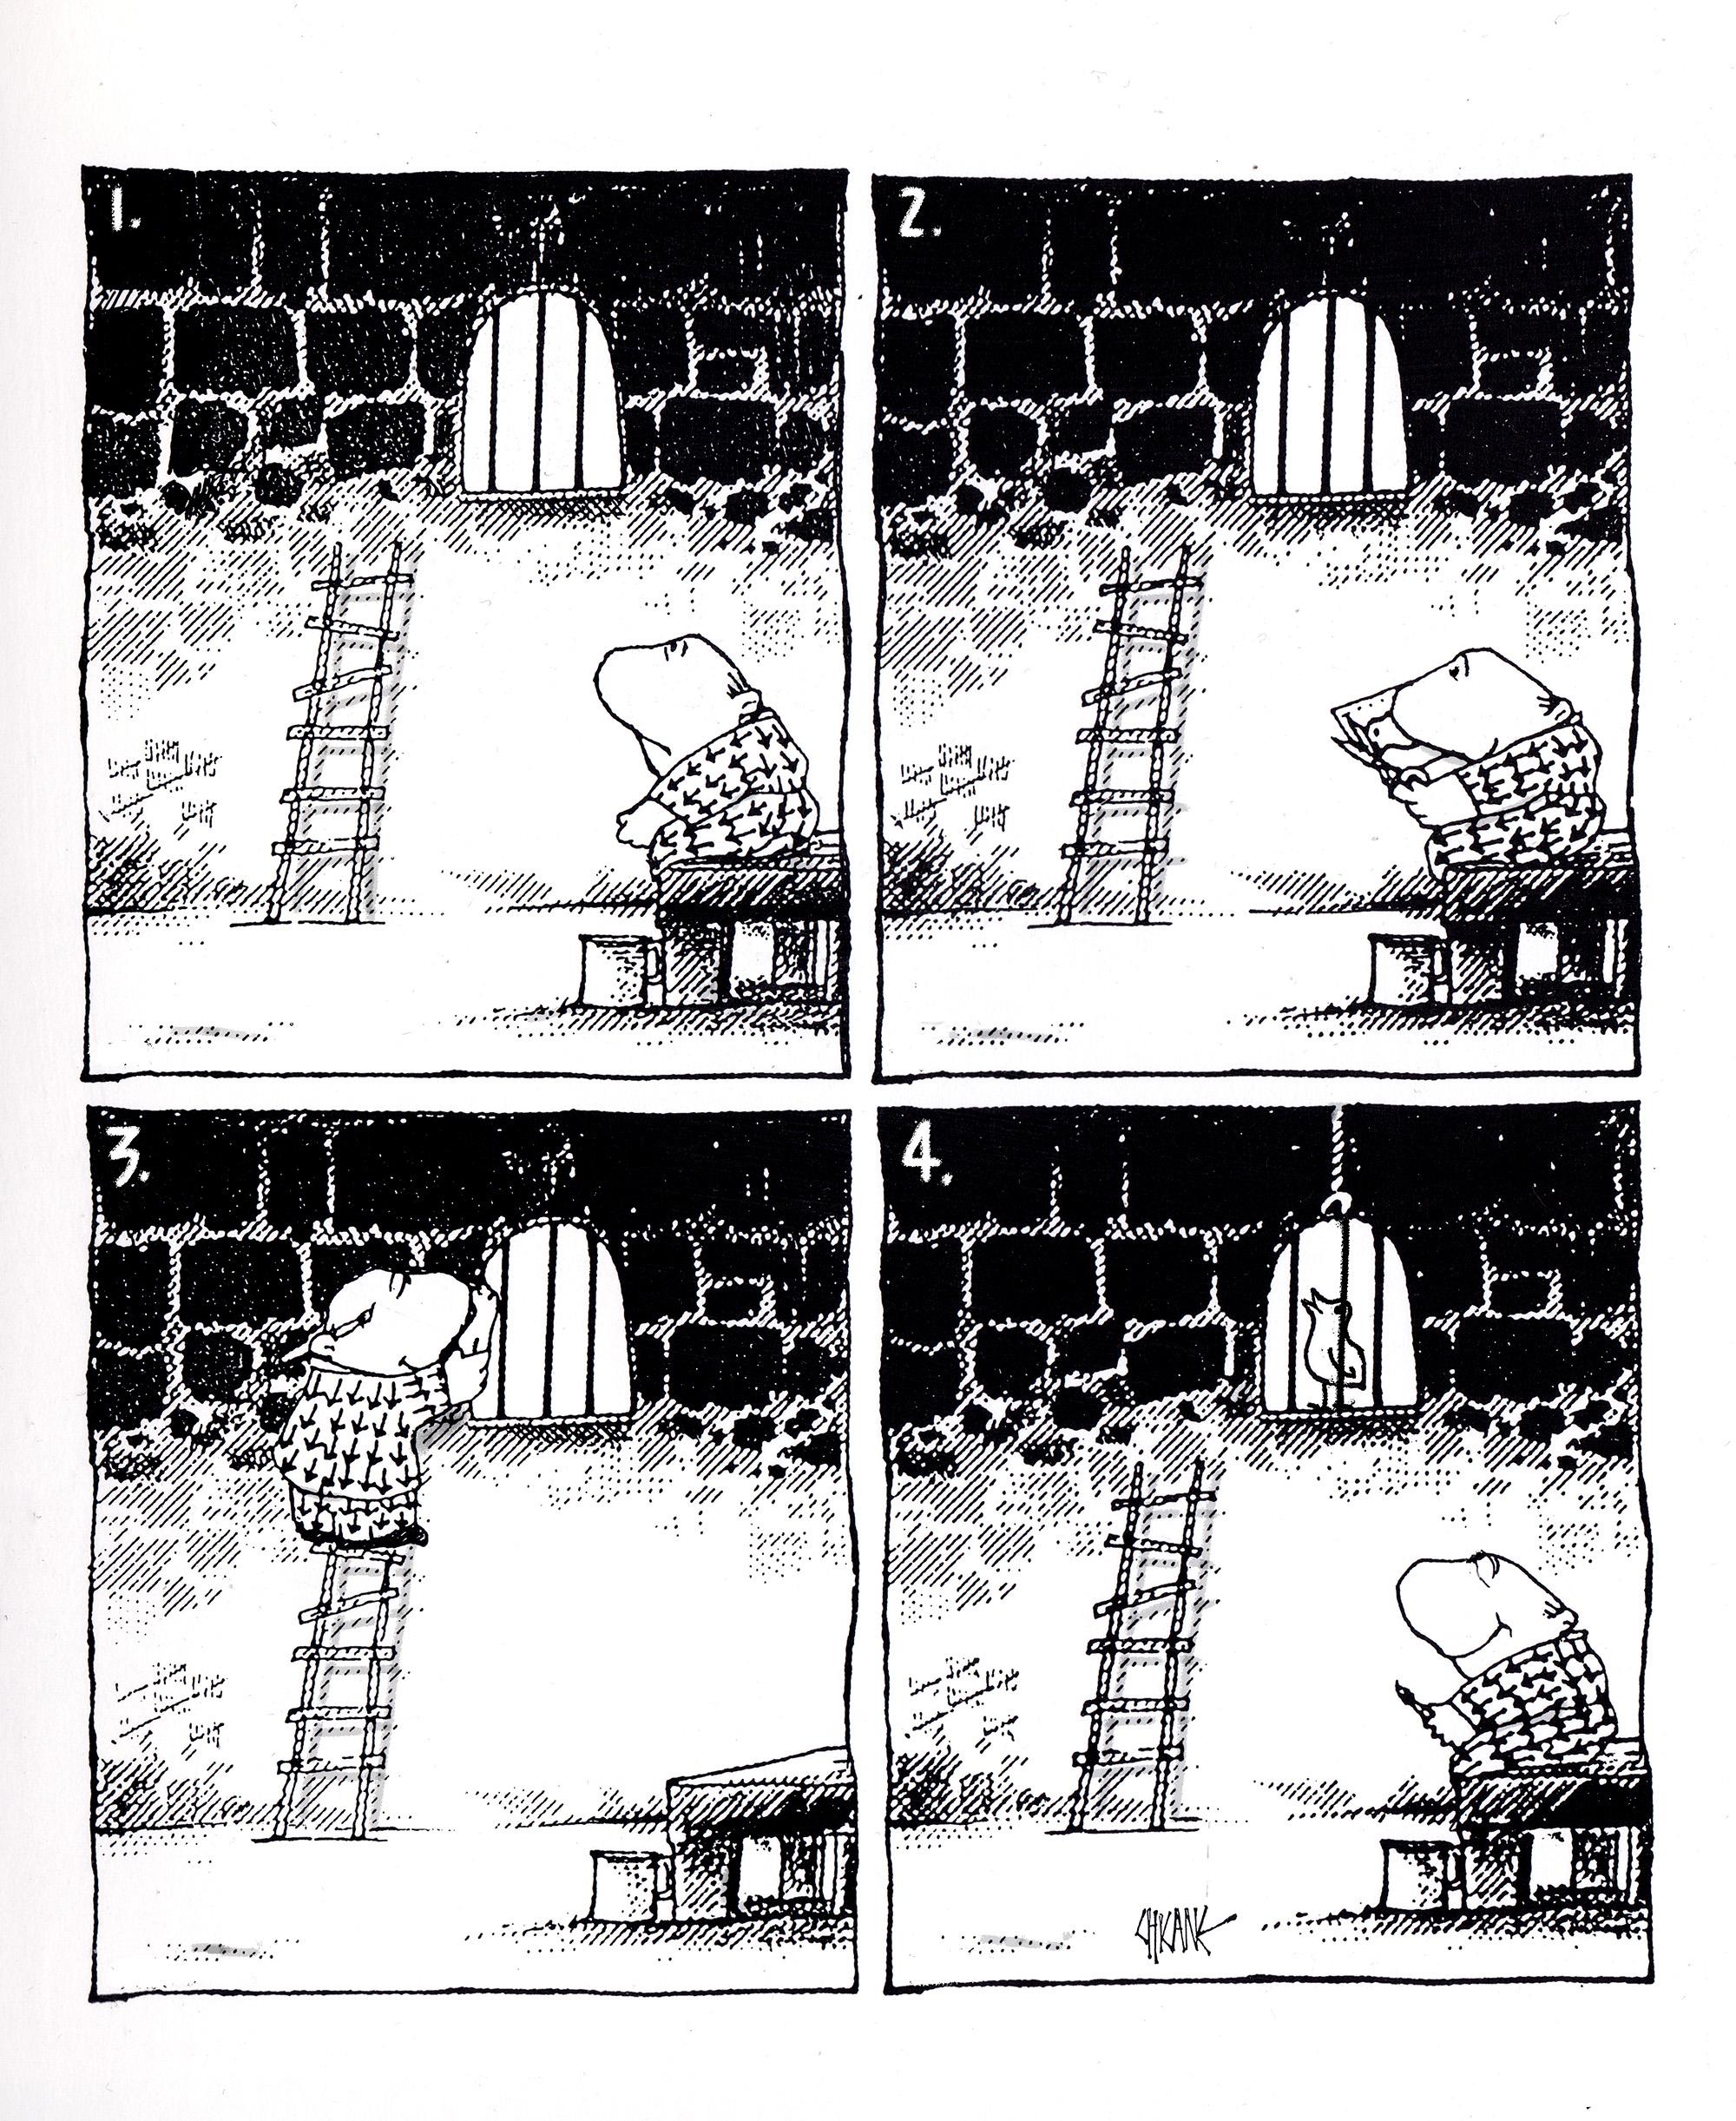 Jailbird cartoon by Chicane